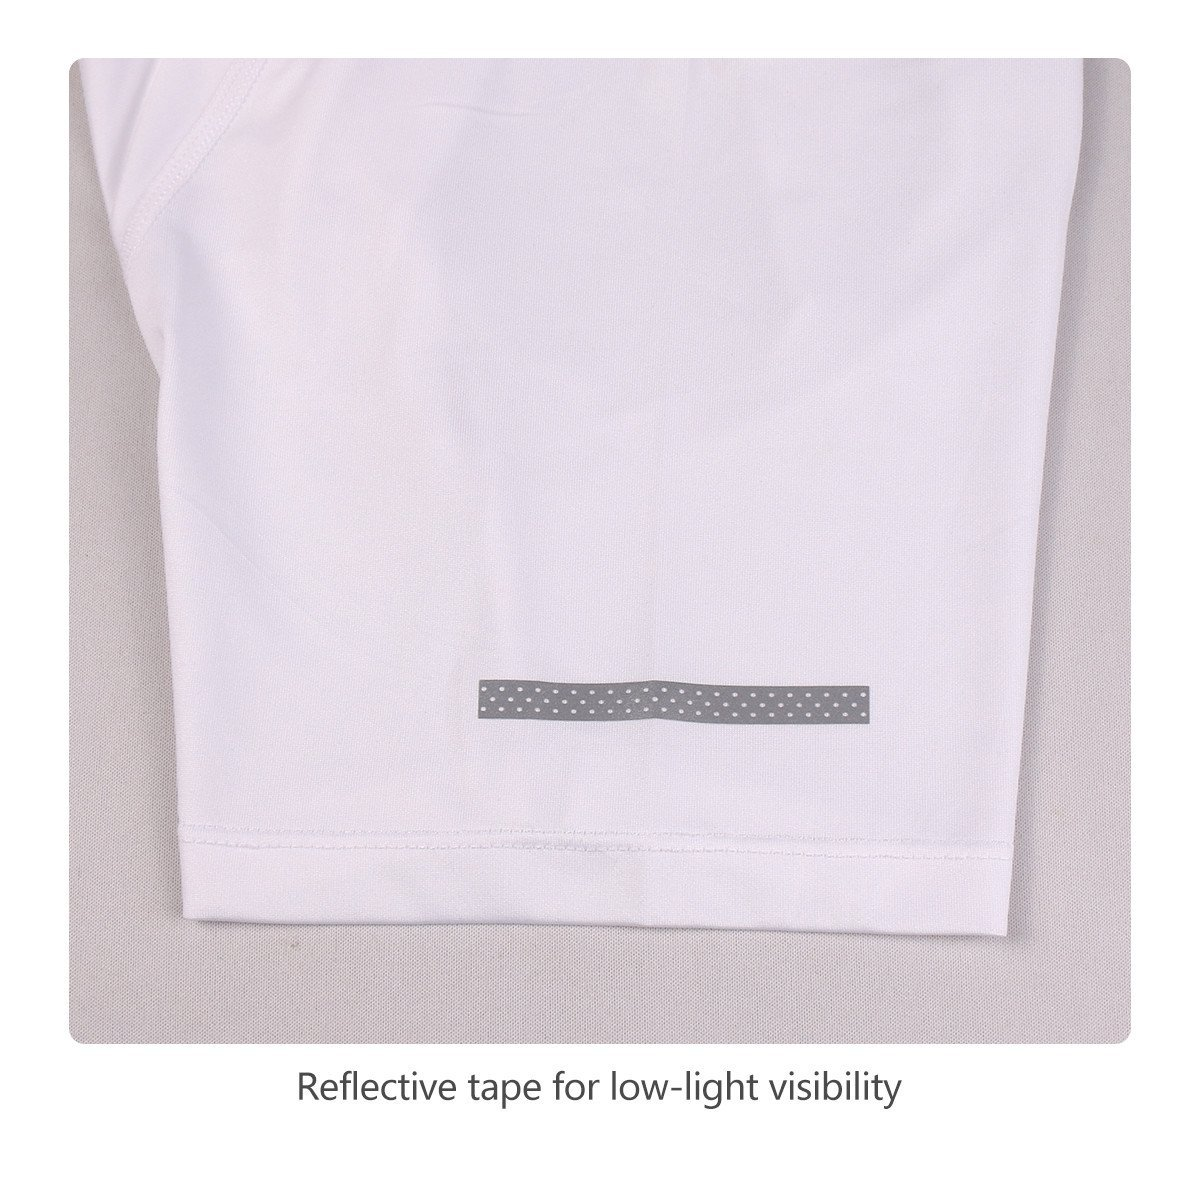 Baleaf Men's Quick Dry Short Sleeve T-Shirt Running Fitness Shirts White Size M by Baleaf (Image #5)